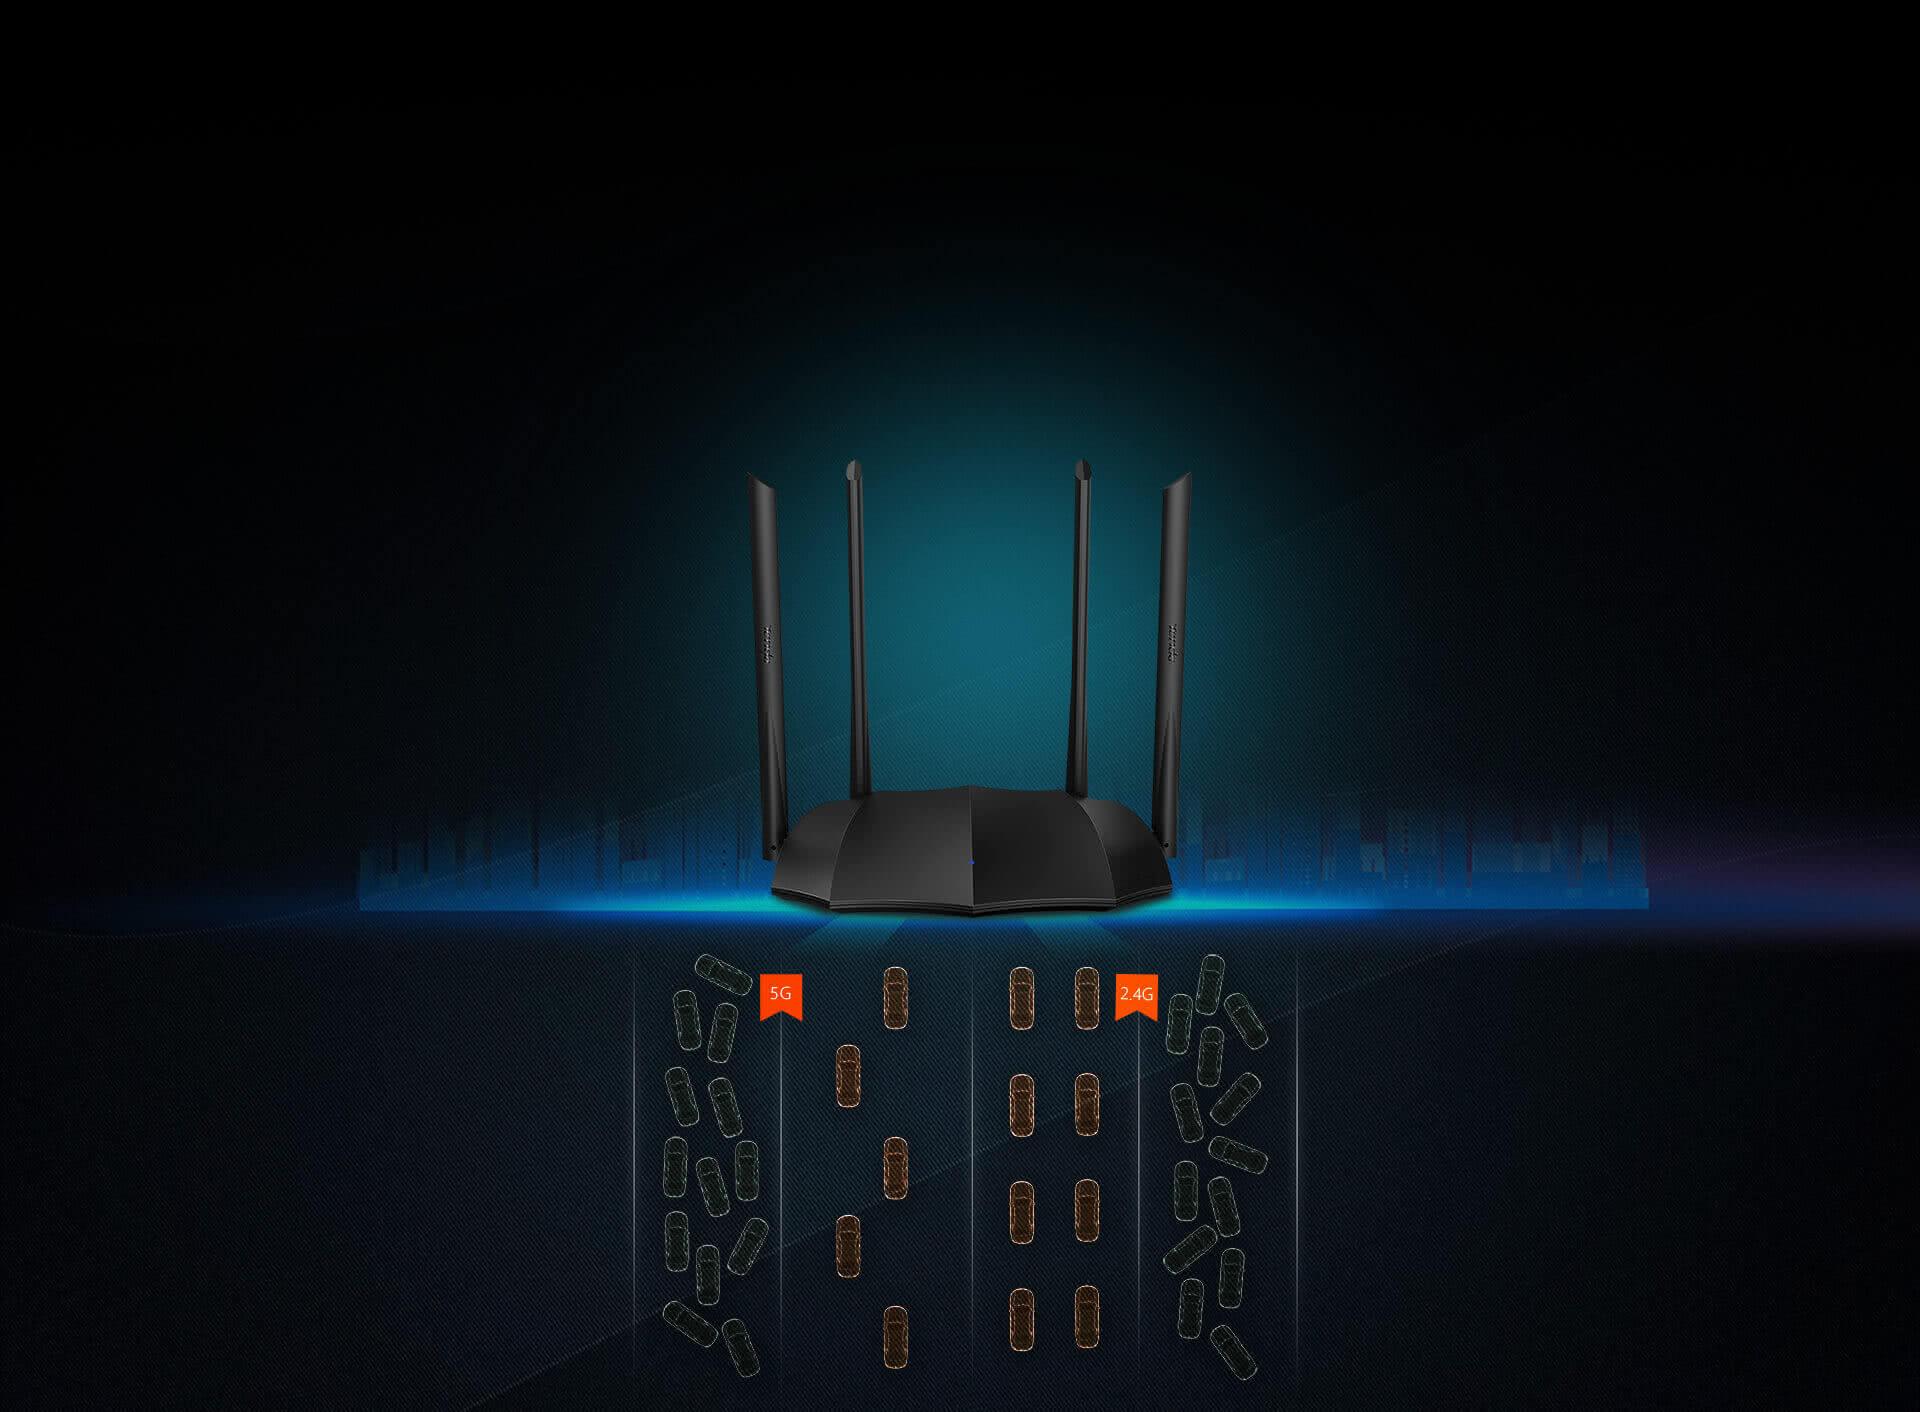 Tenda AC8 Dual Band 5Ghz & 2.4Ghz Gigabit Wifi Router